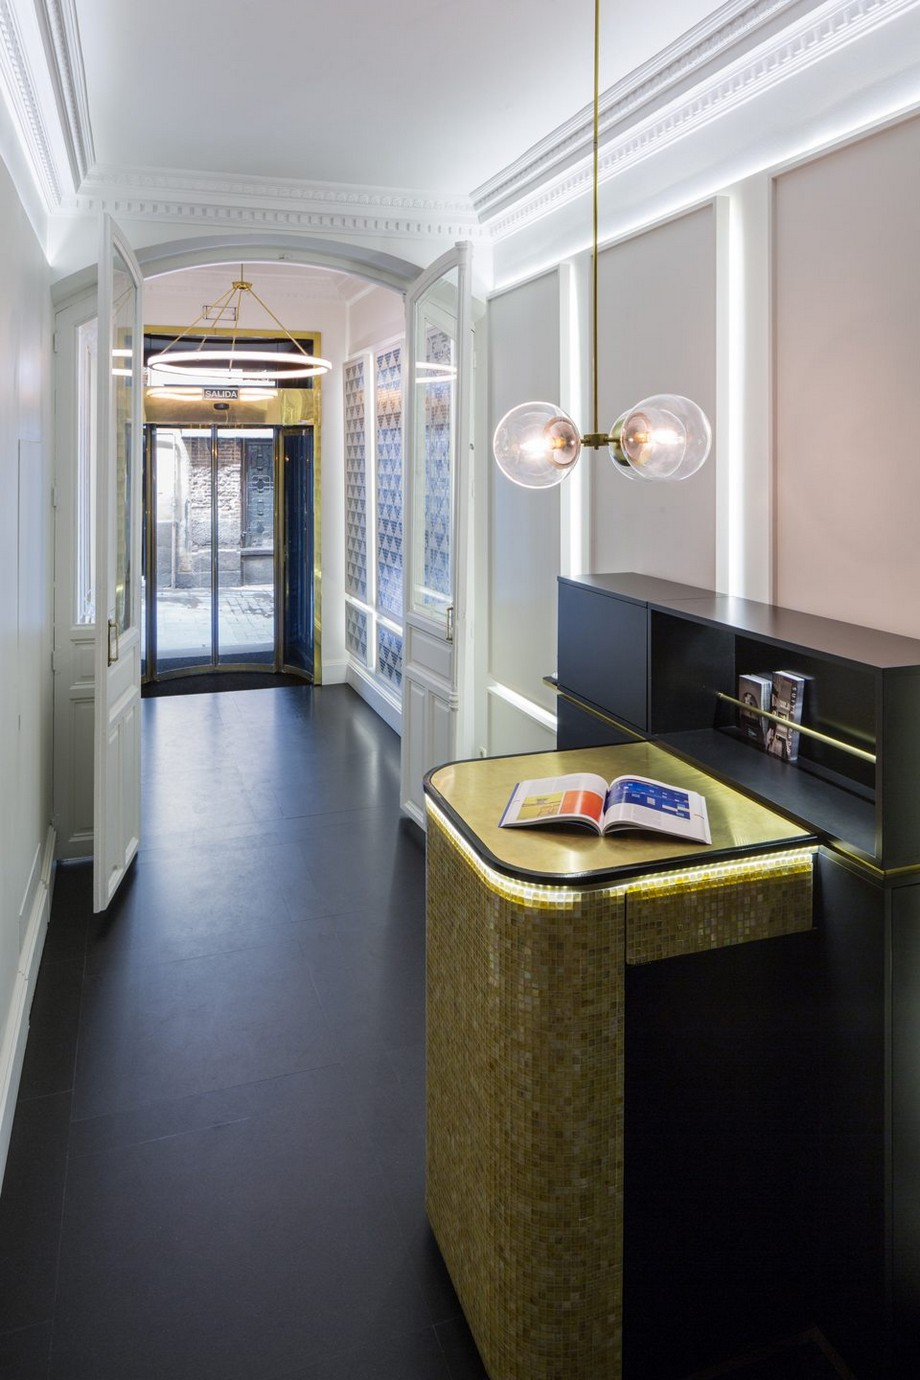 Estudio Ventura: Diseño de interiores poderoso y lujuoso en Madrid estudio ventura Estudio Ventura: Diseño de interiores poderoso y lujuoso en Madrid Ventura lobbySuites 6